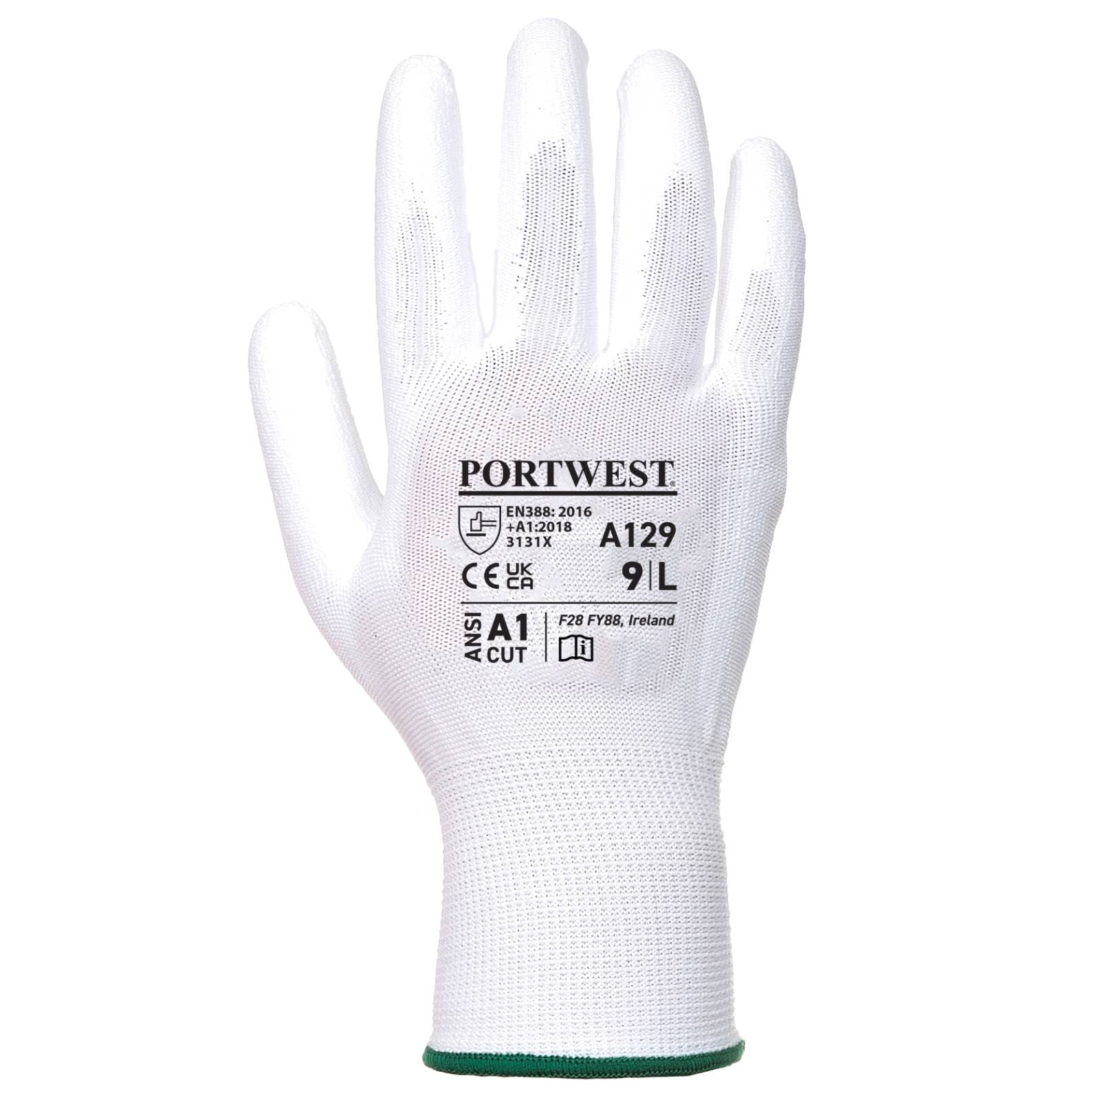 Portwest Handschoenen A129 wit(WH)